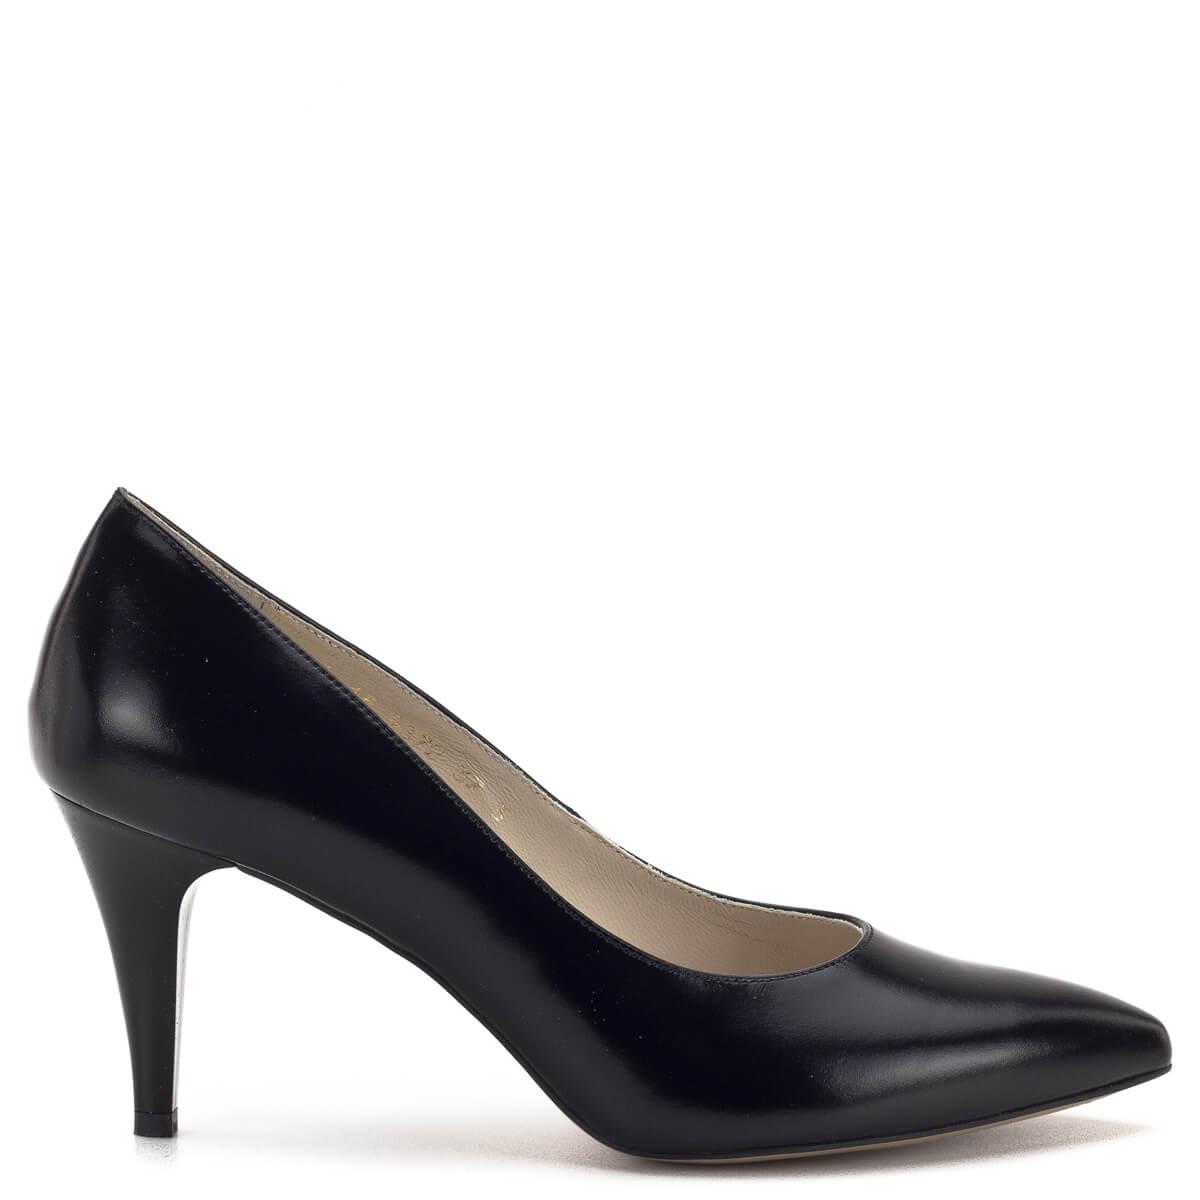 Női Cipő Hegyes Orrú Magassarkú Alkalmi Cipők Magas Sarok